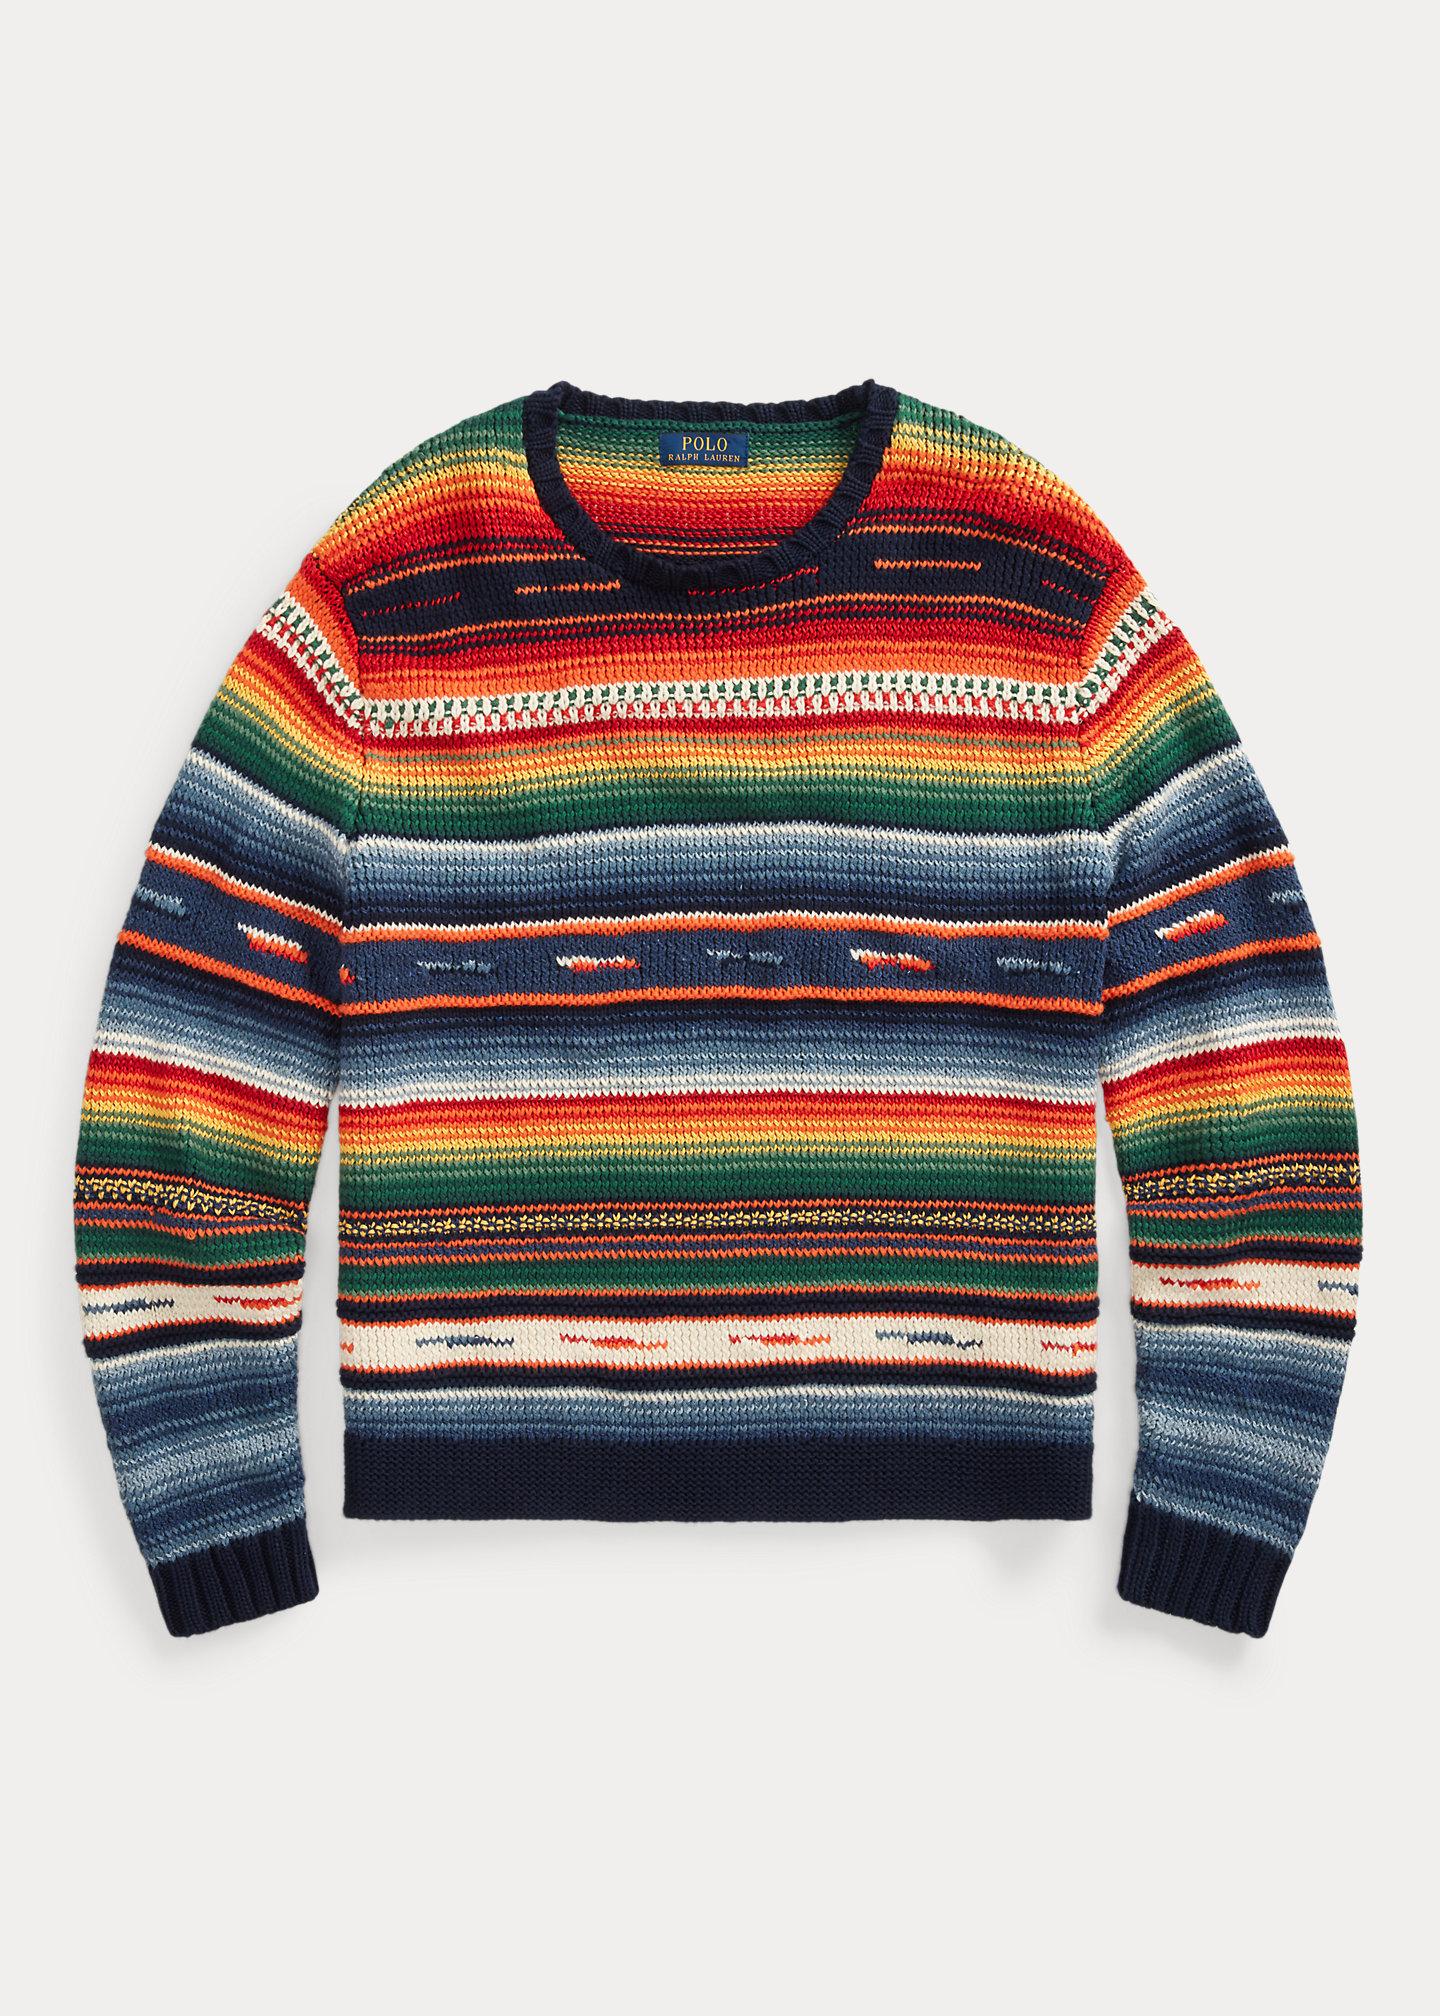 Aquí nos hemos dado un capricho. Este jersey es de Polo Ralph Lauren...